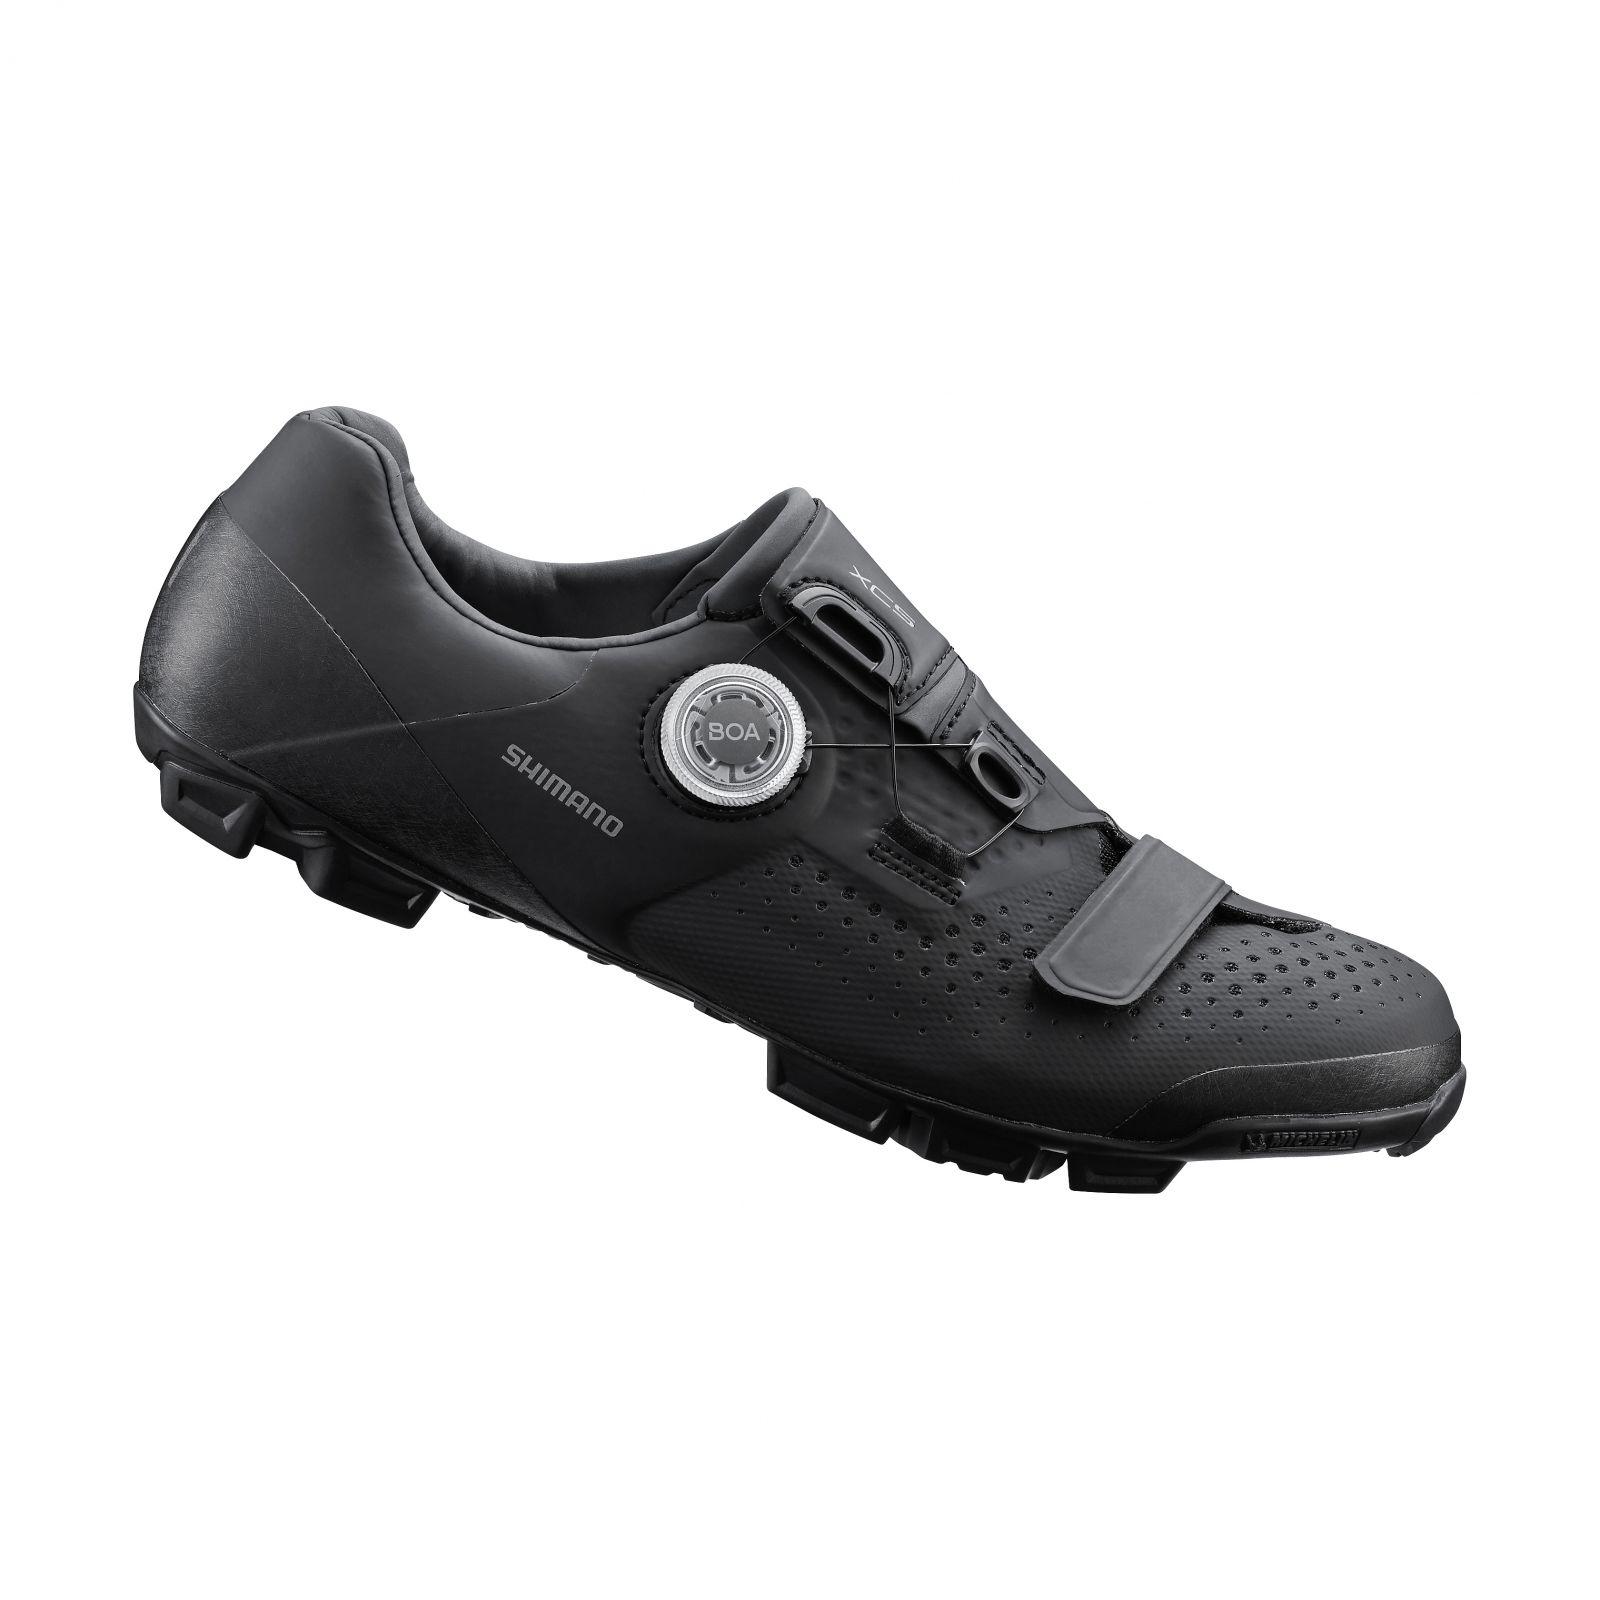 SHIMANO MTB obuv SH-XC501ML, černá, 48